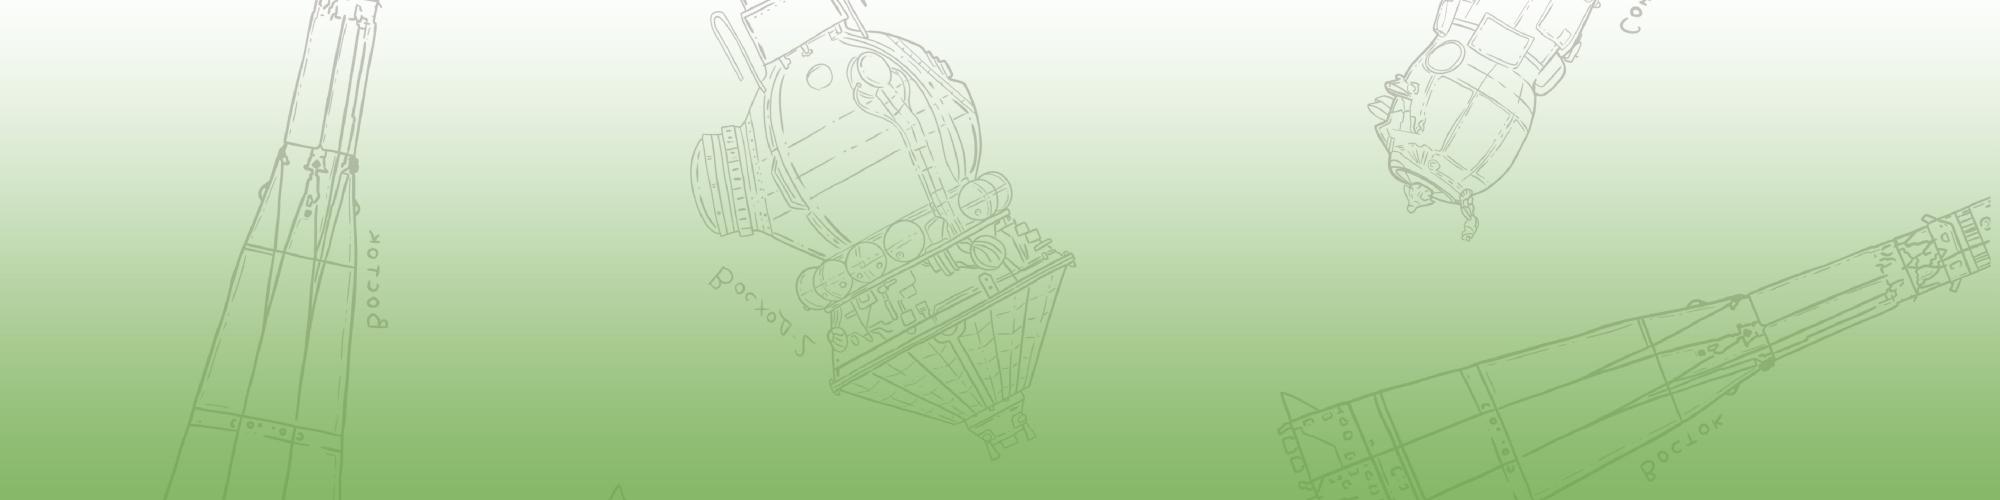 https://res.cloudinary.com/accelevents/image/fetch/c_fill,dpr_1.0,f_auto,fl_lossy,h_500,q_100,w_2000/https://s3.amazonaws.com/v2-s3-prod-accelevents/ca66c59c-1838-43b8-90cd-5124103631da